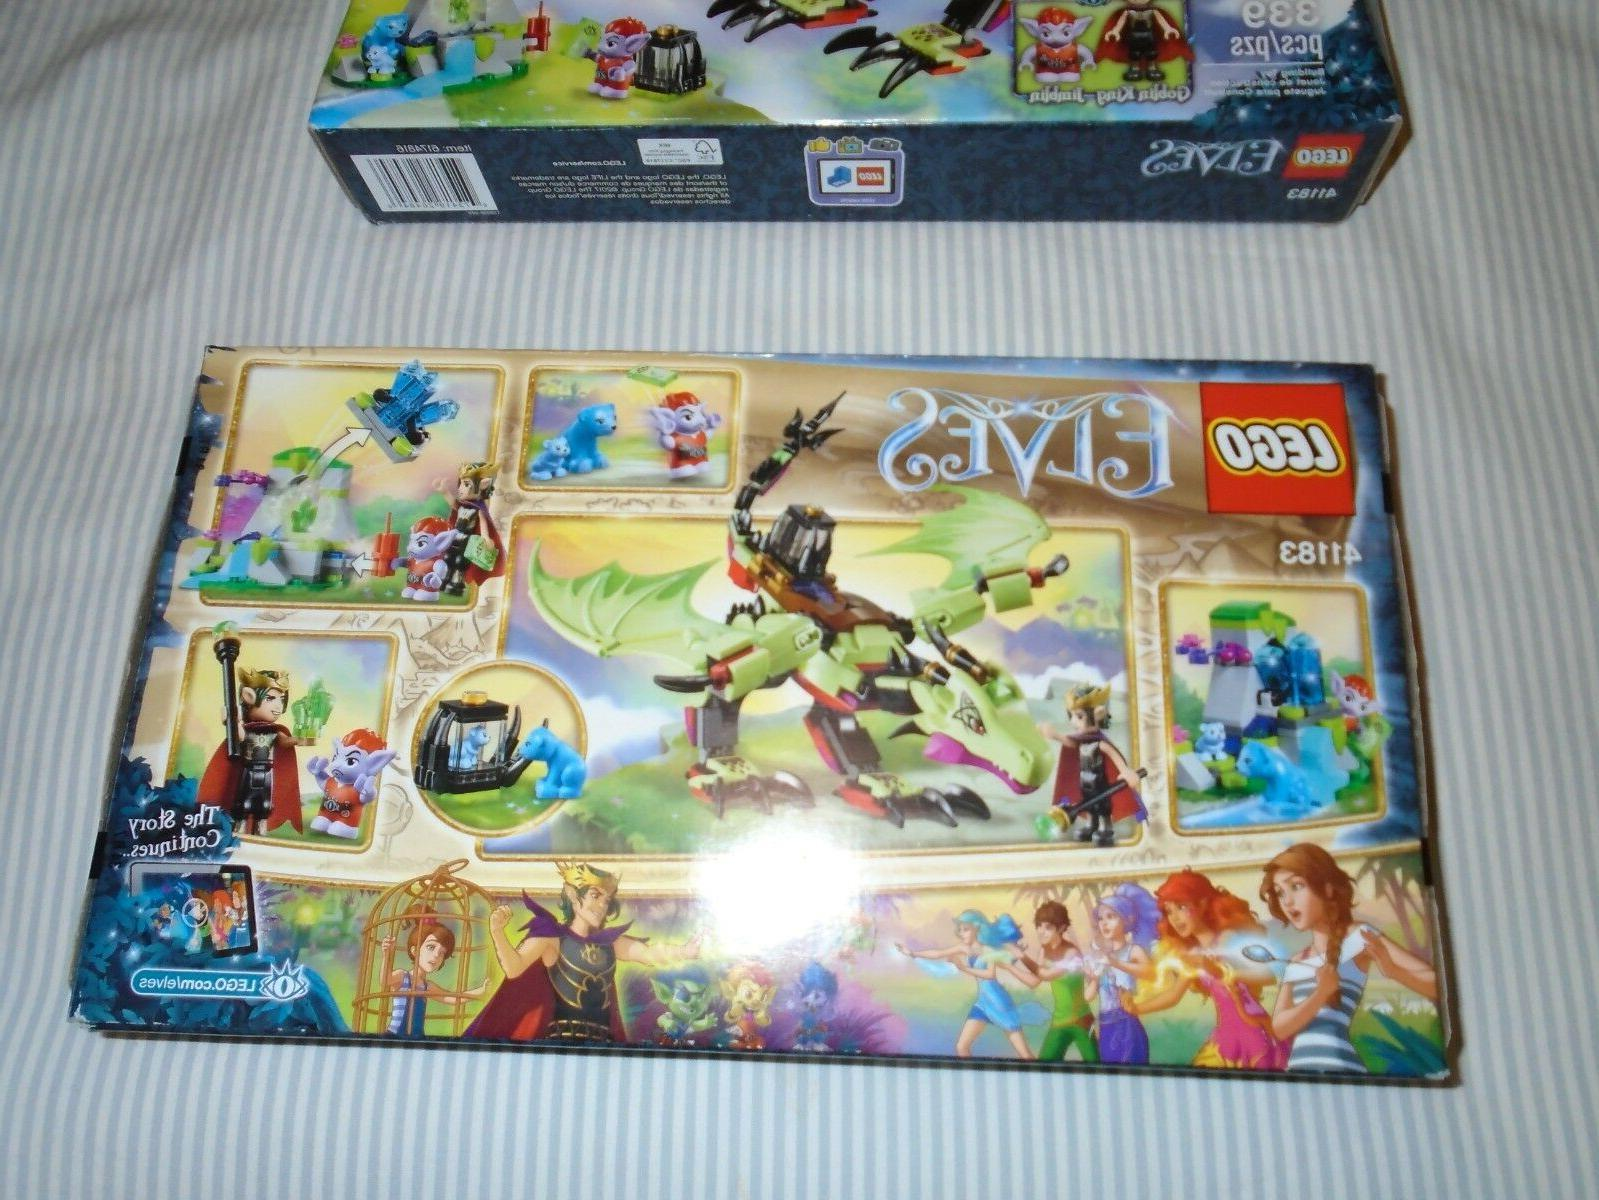 LEGO ELVES GOBLIN EVIL DRAGON PLAYSET! SEALED NEW-Free